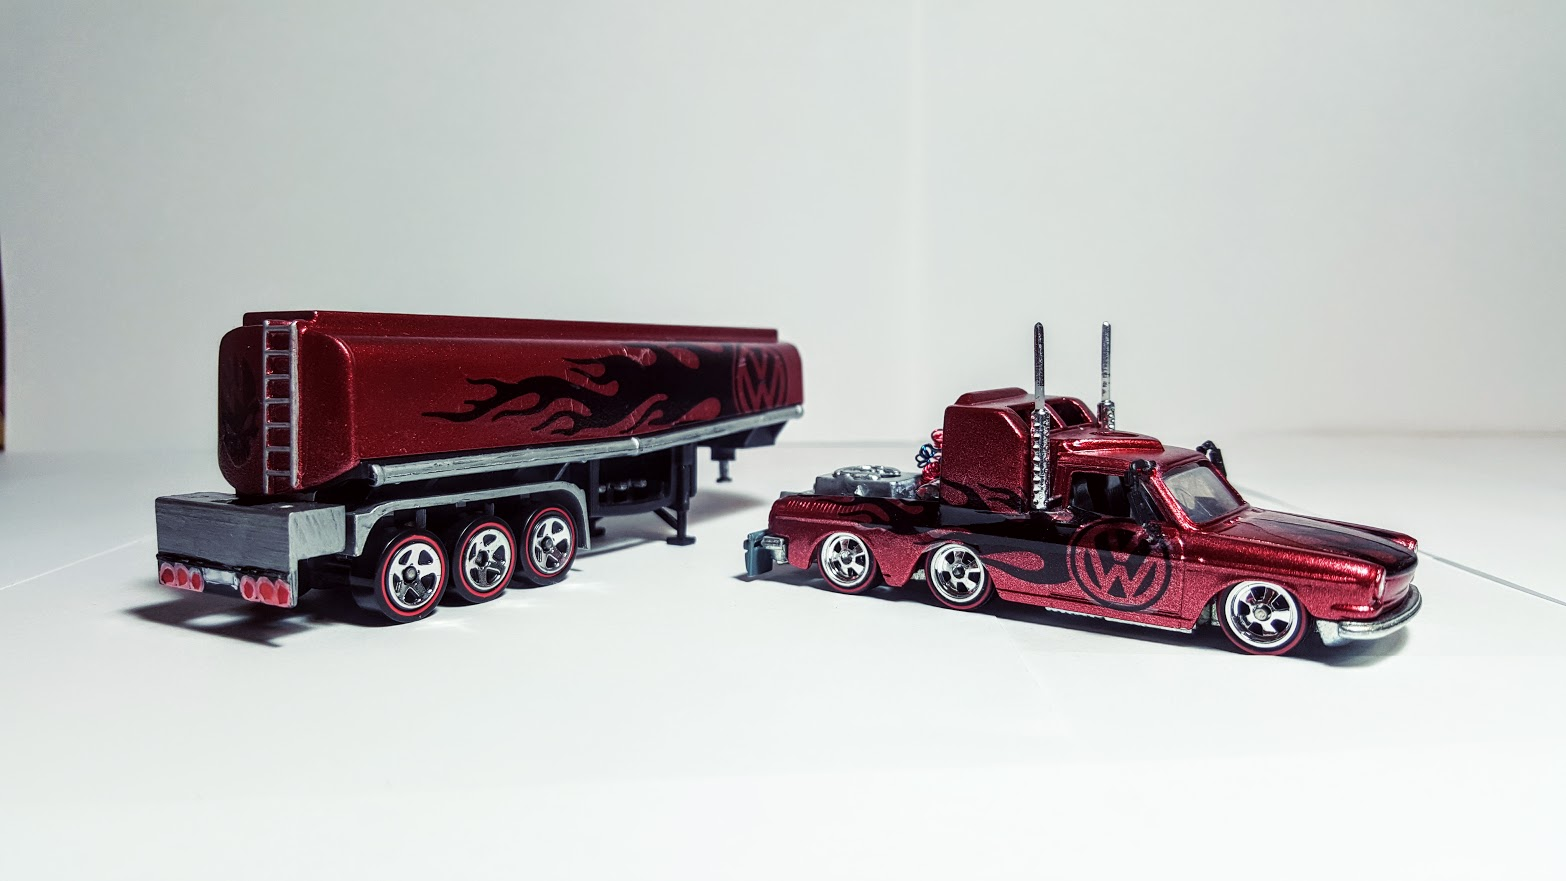 volkswagen squareback tanker truck my custom hot wheels. Black Bedroom Furniture Sets. Home Design Ideas